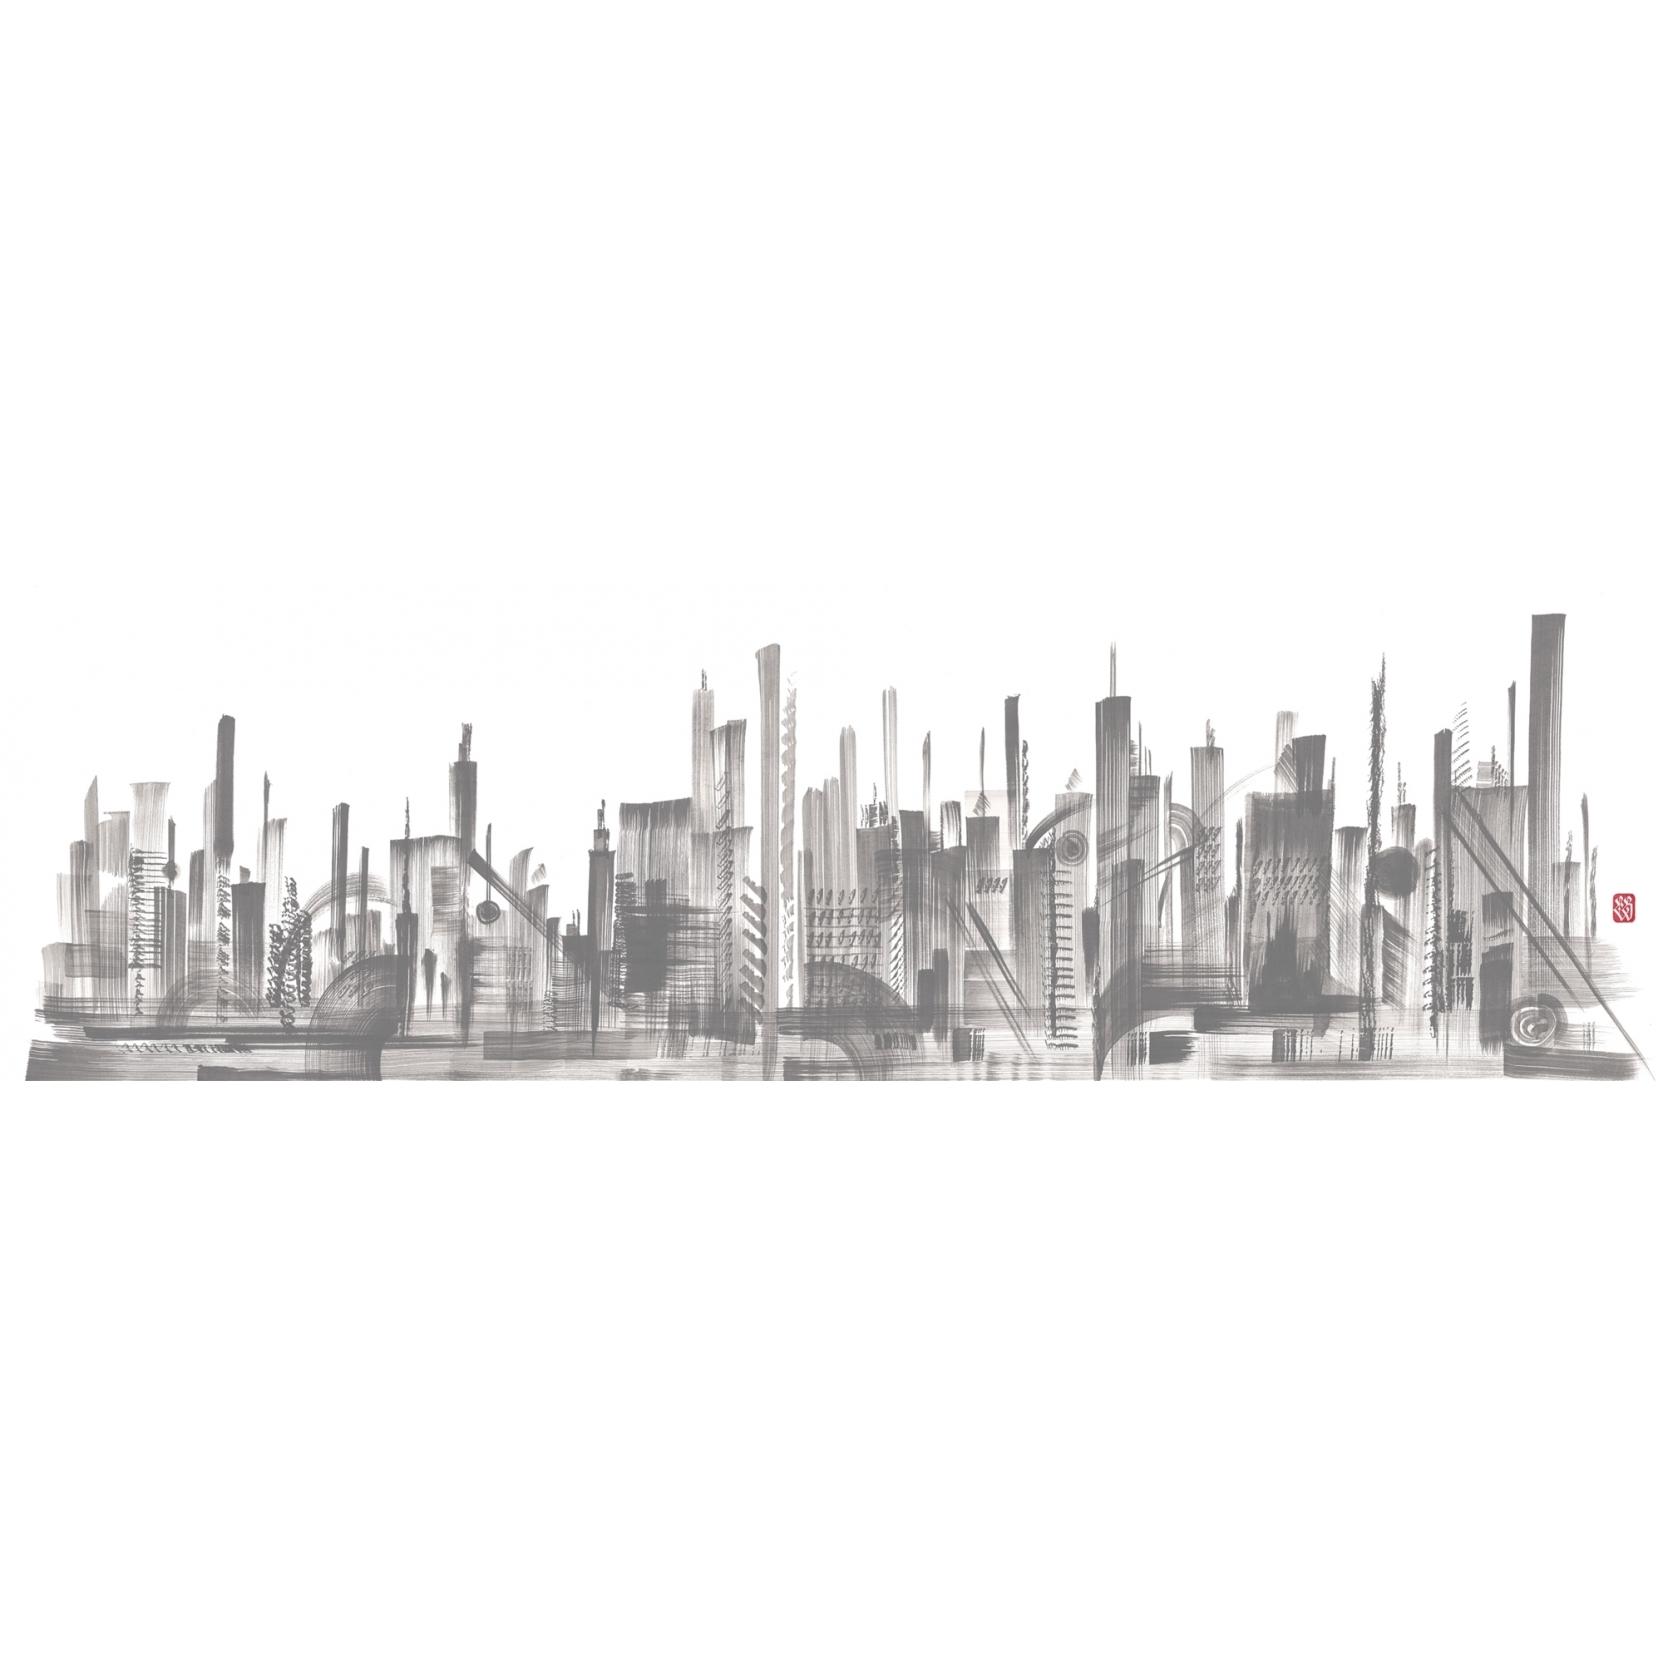 London Art Skyline Wallpaper Tattahome